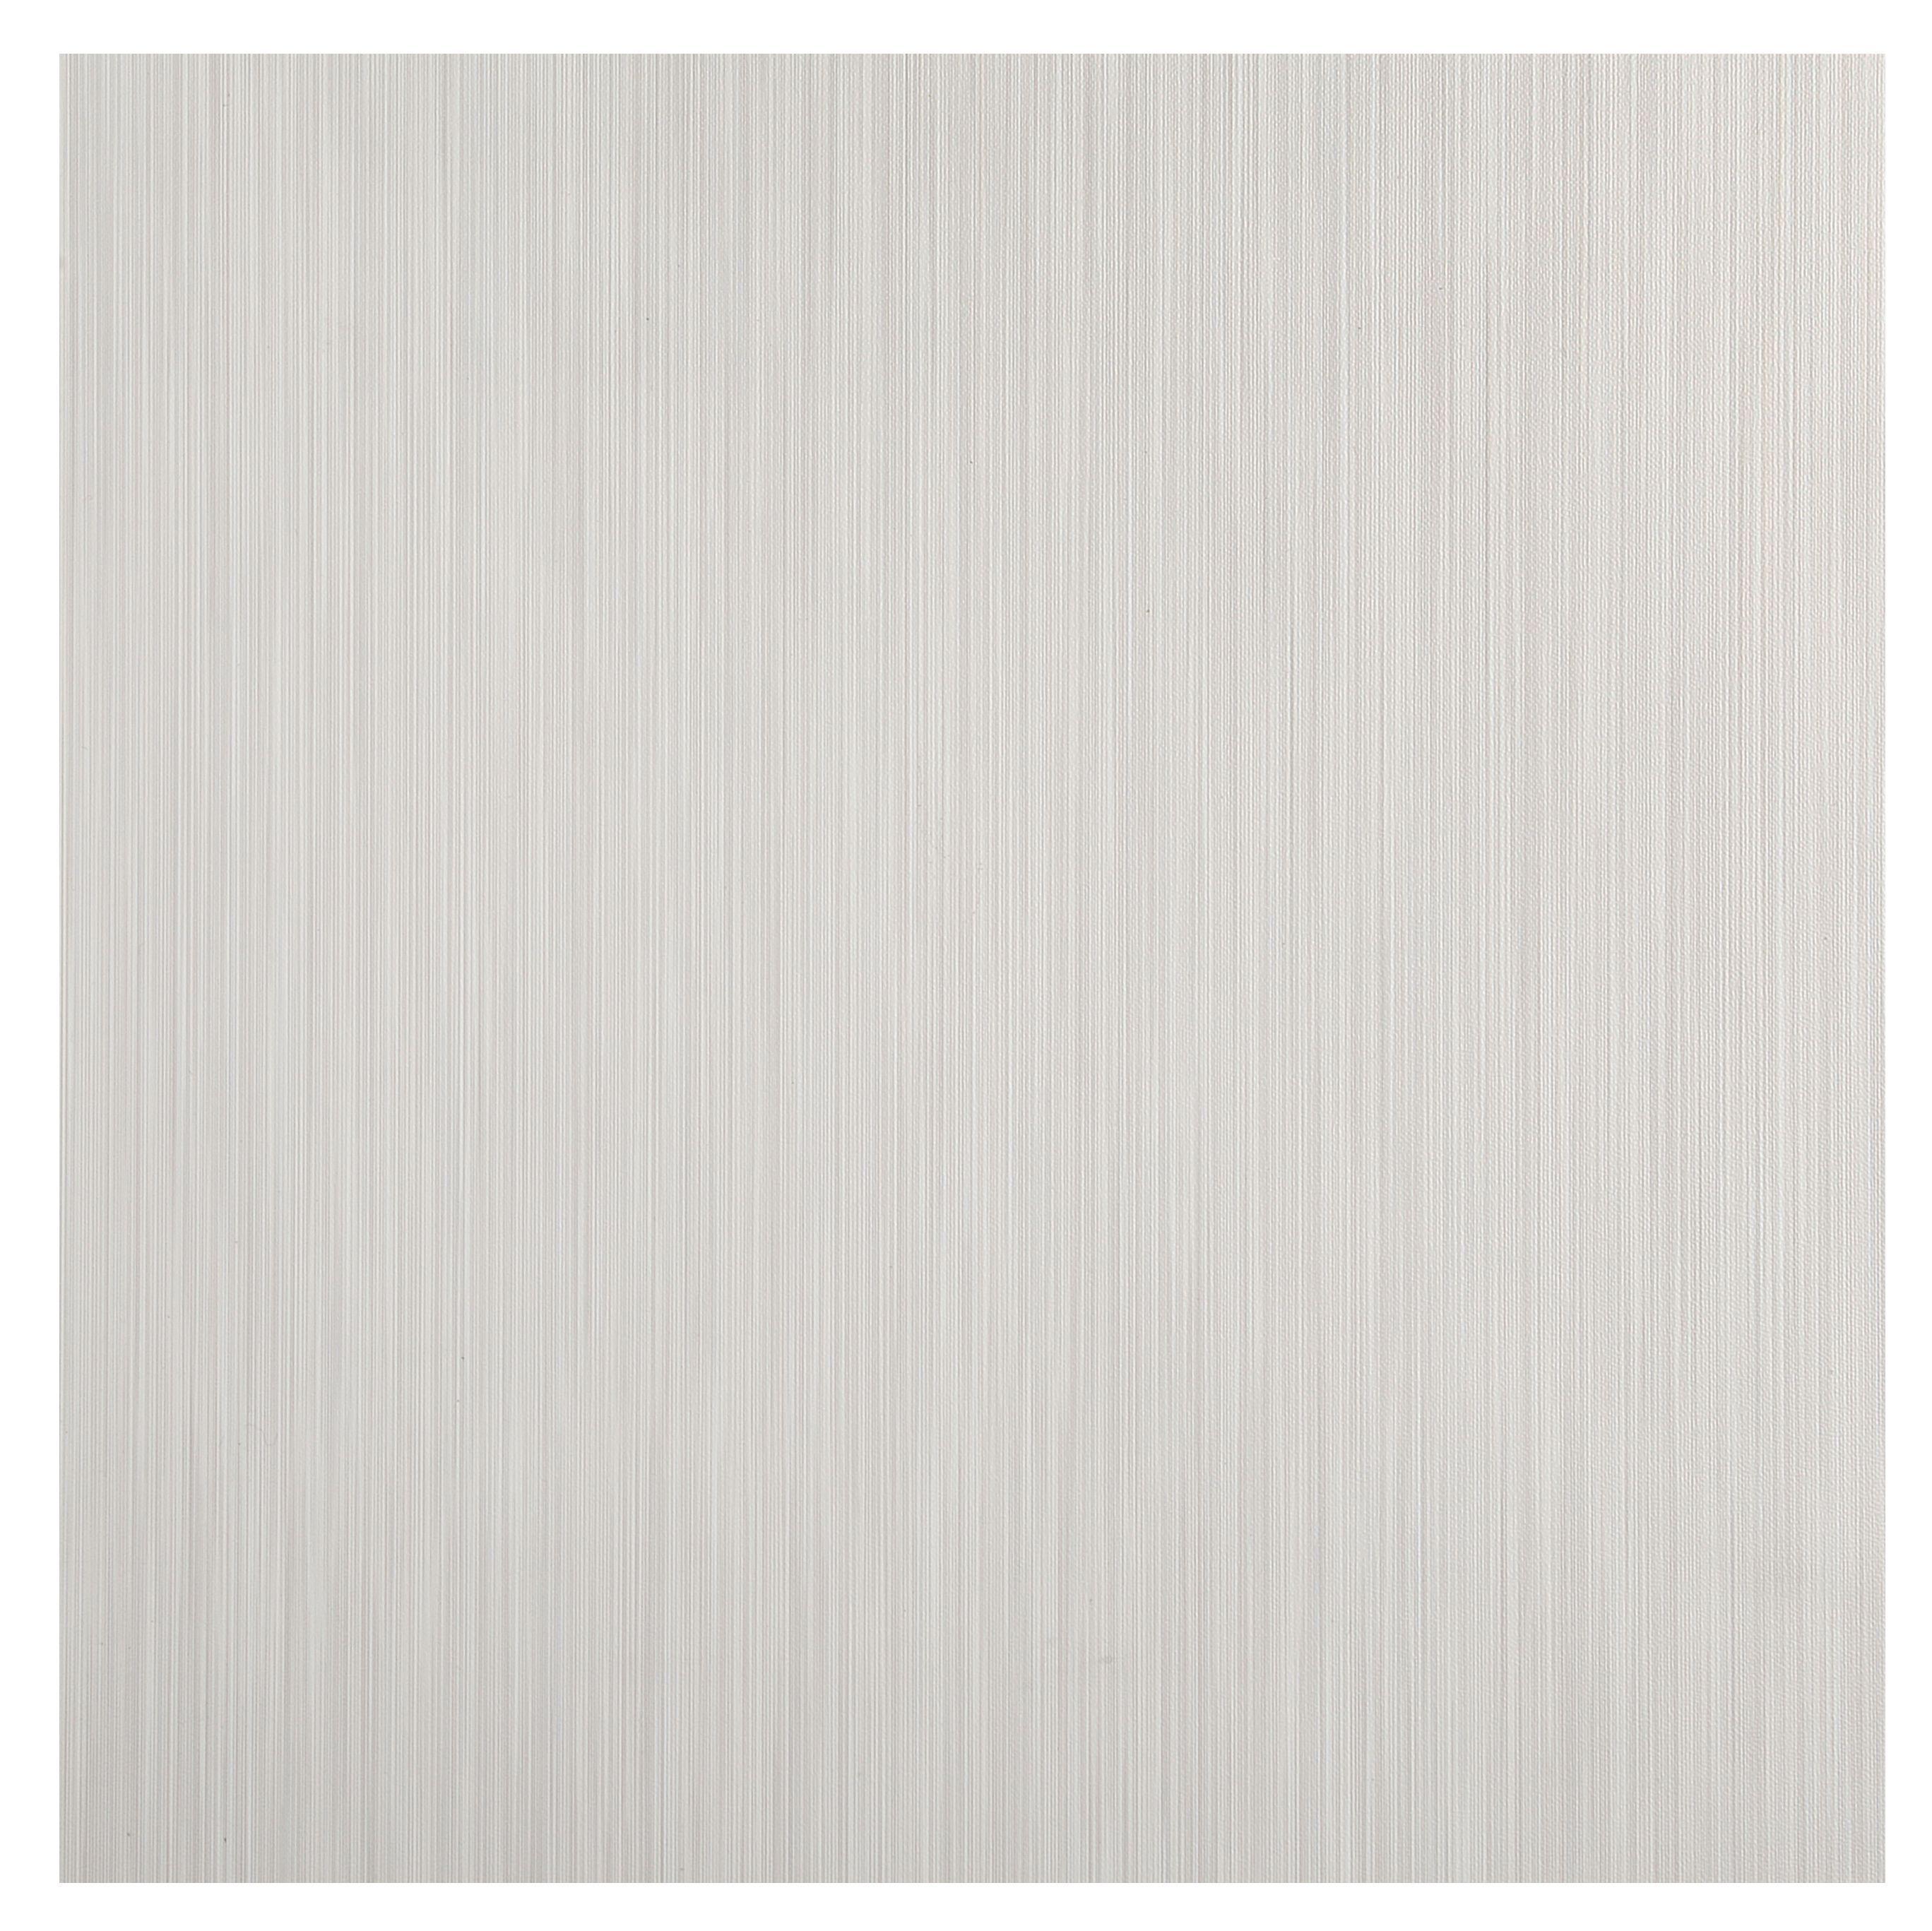 Colours Beige Brushed Self Adhesive Vinyl Tile 1.02m² Pack